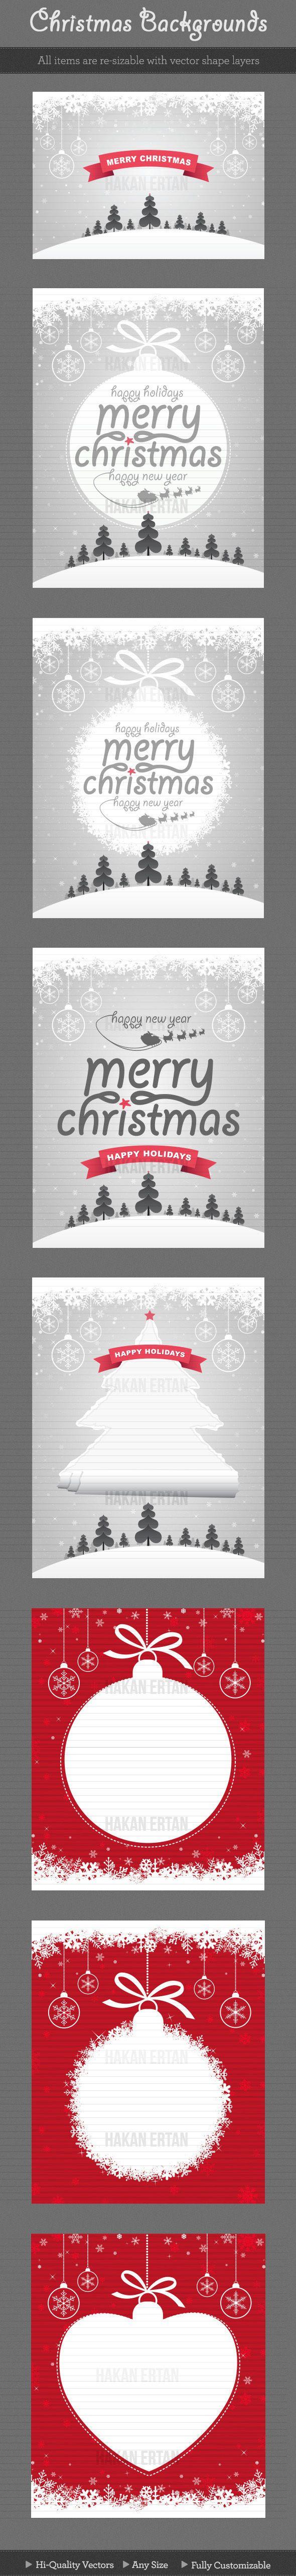 Christmas Backgrounds by hakan ertan, via Behance